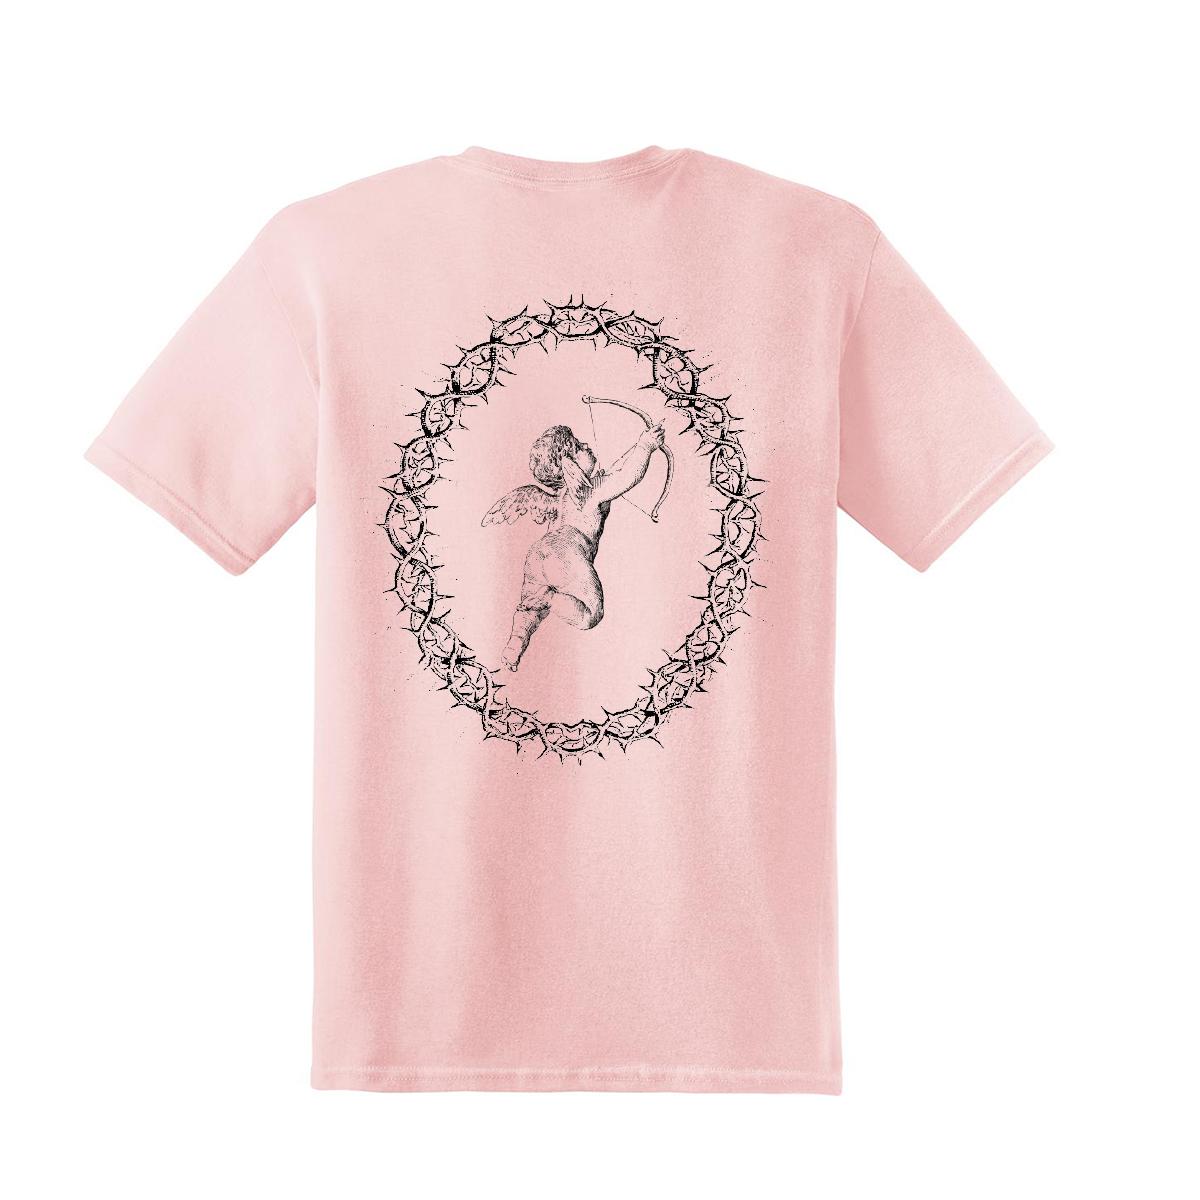 Camila Cupid Light Pink Tee + Digital Album Download